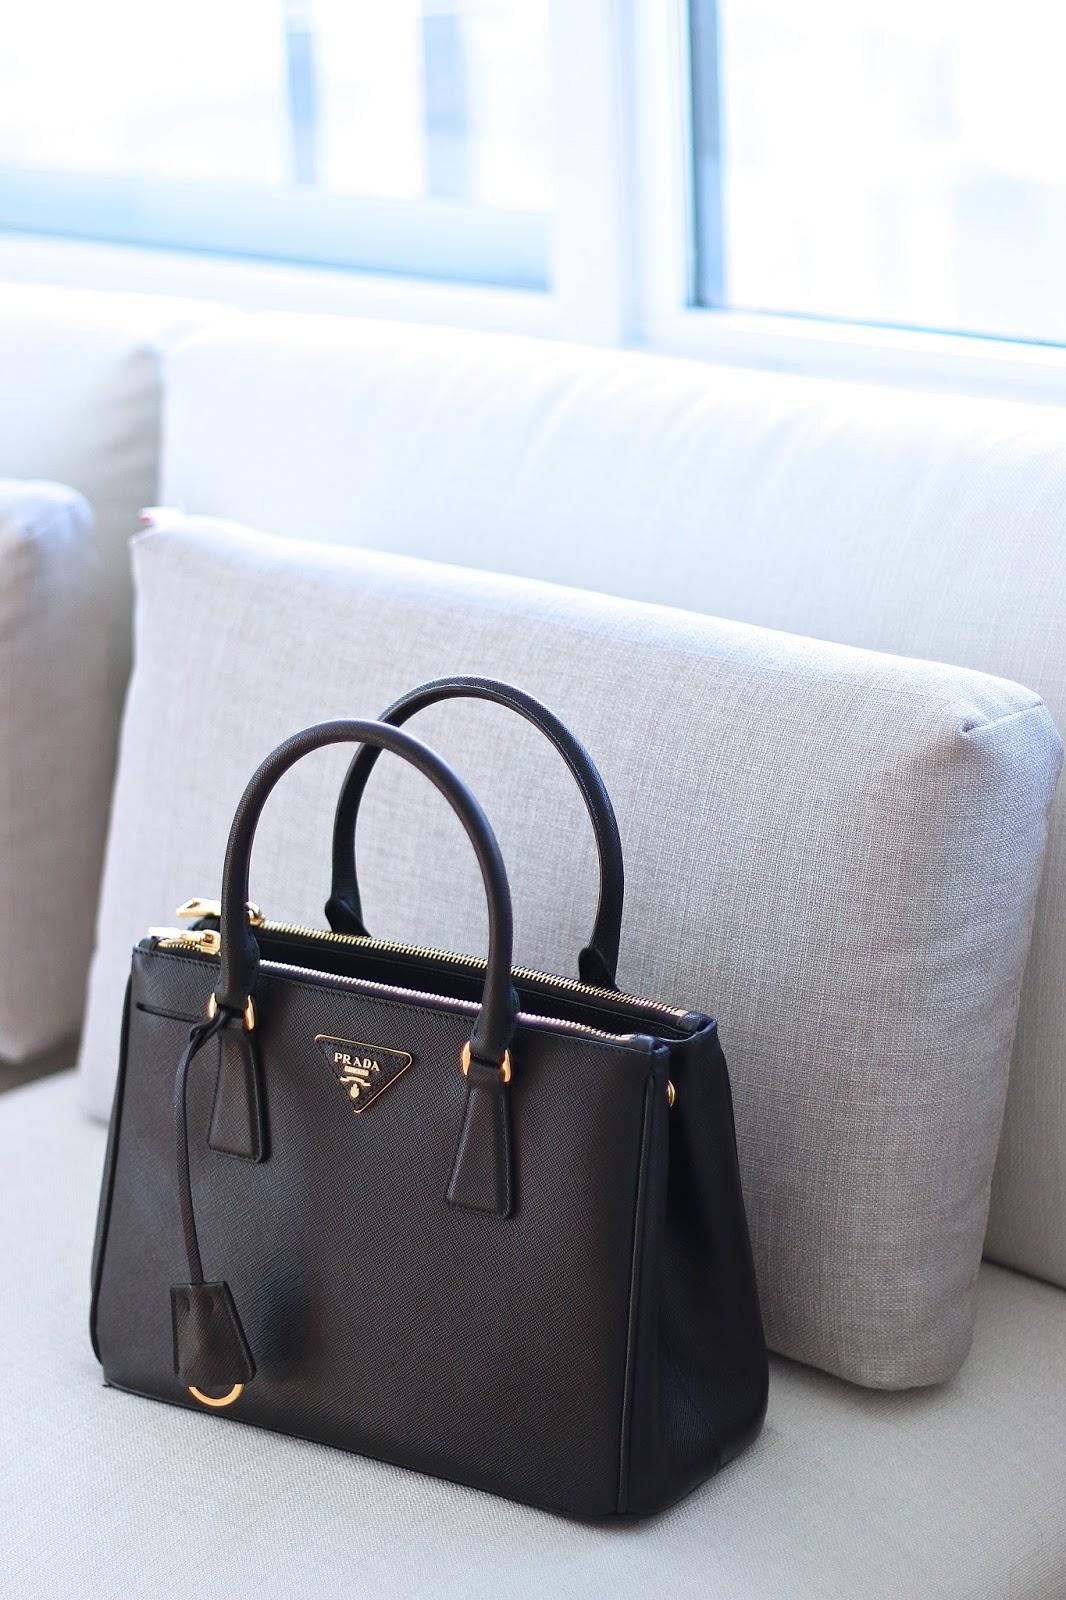 My Prada Saffiano Double Zip Review Andrea Clare